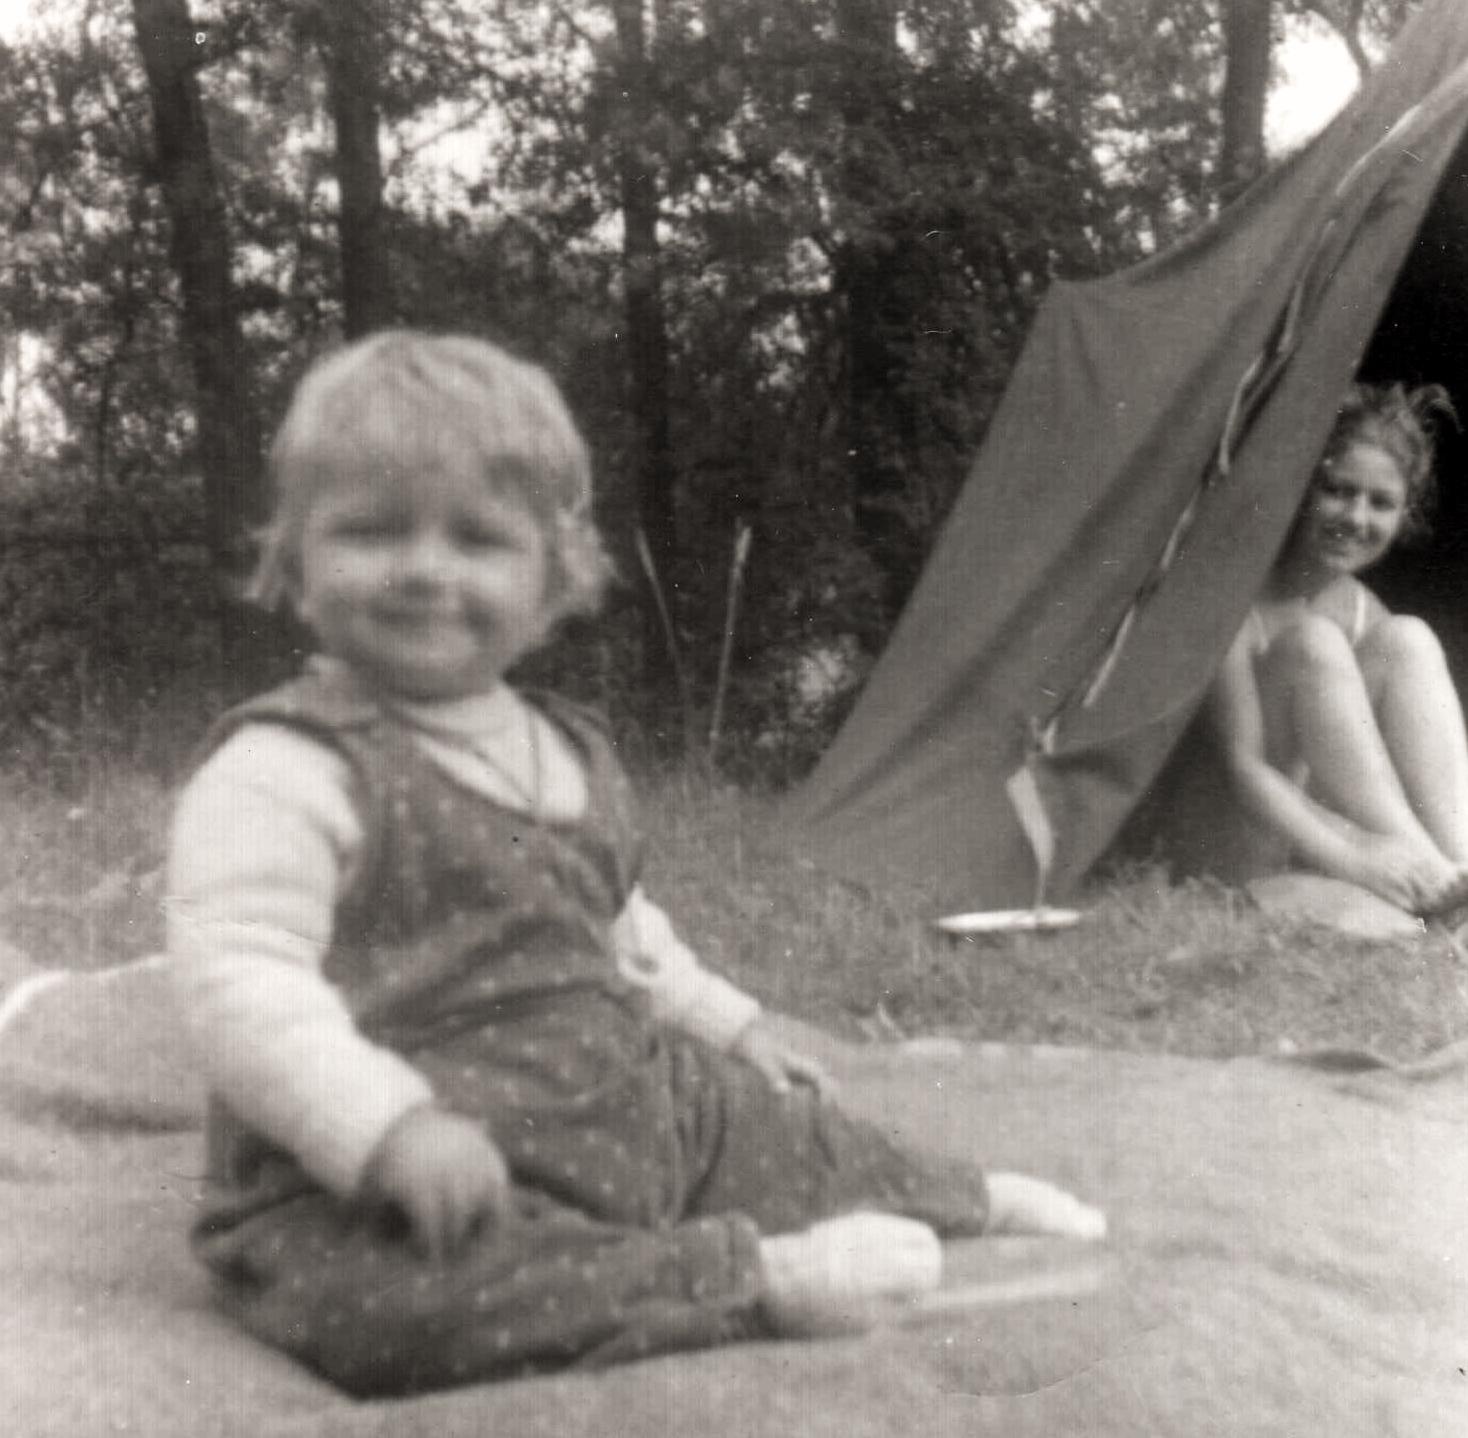 Camping-Rapstejn-Anna-Hilmar